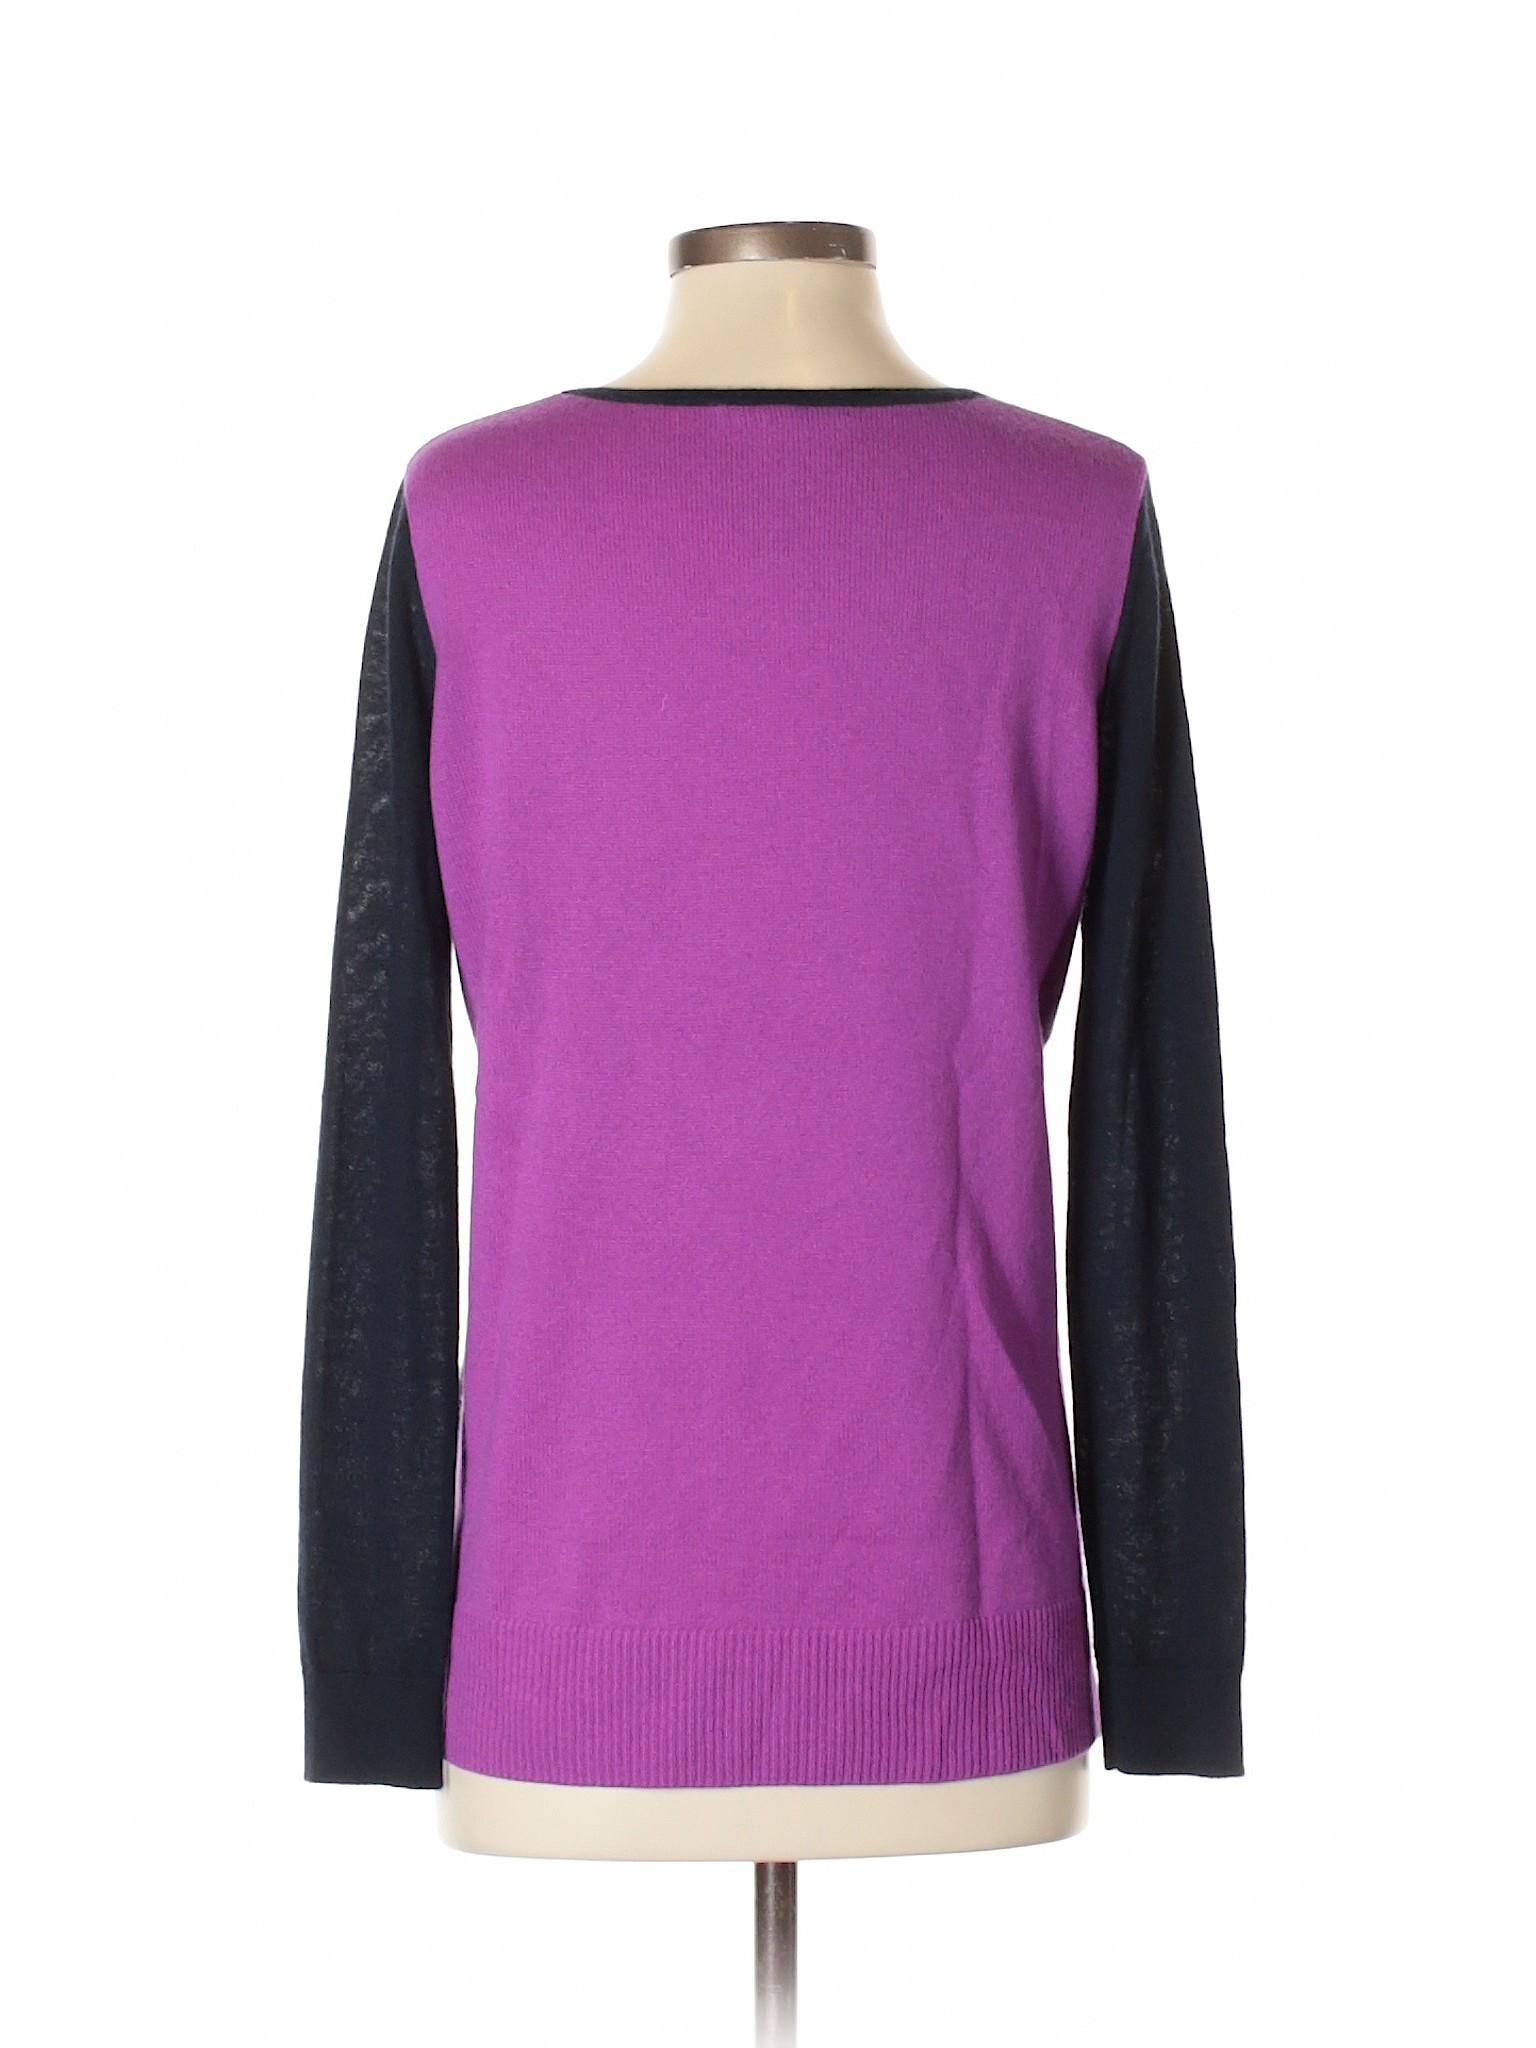 Neiman Marcus Boutique Pullover Boutique Pullover Sweater Neiman Sweater Boutique Marcus WnYZYagq